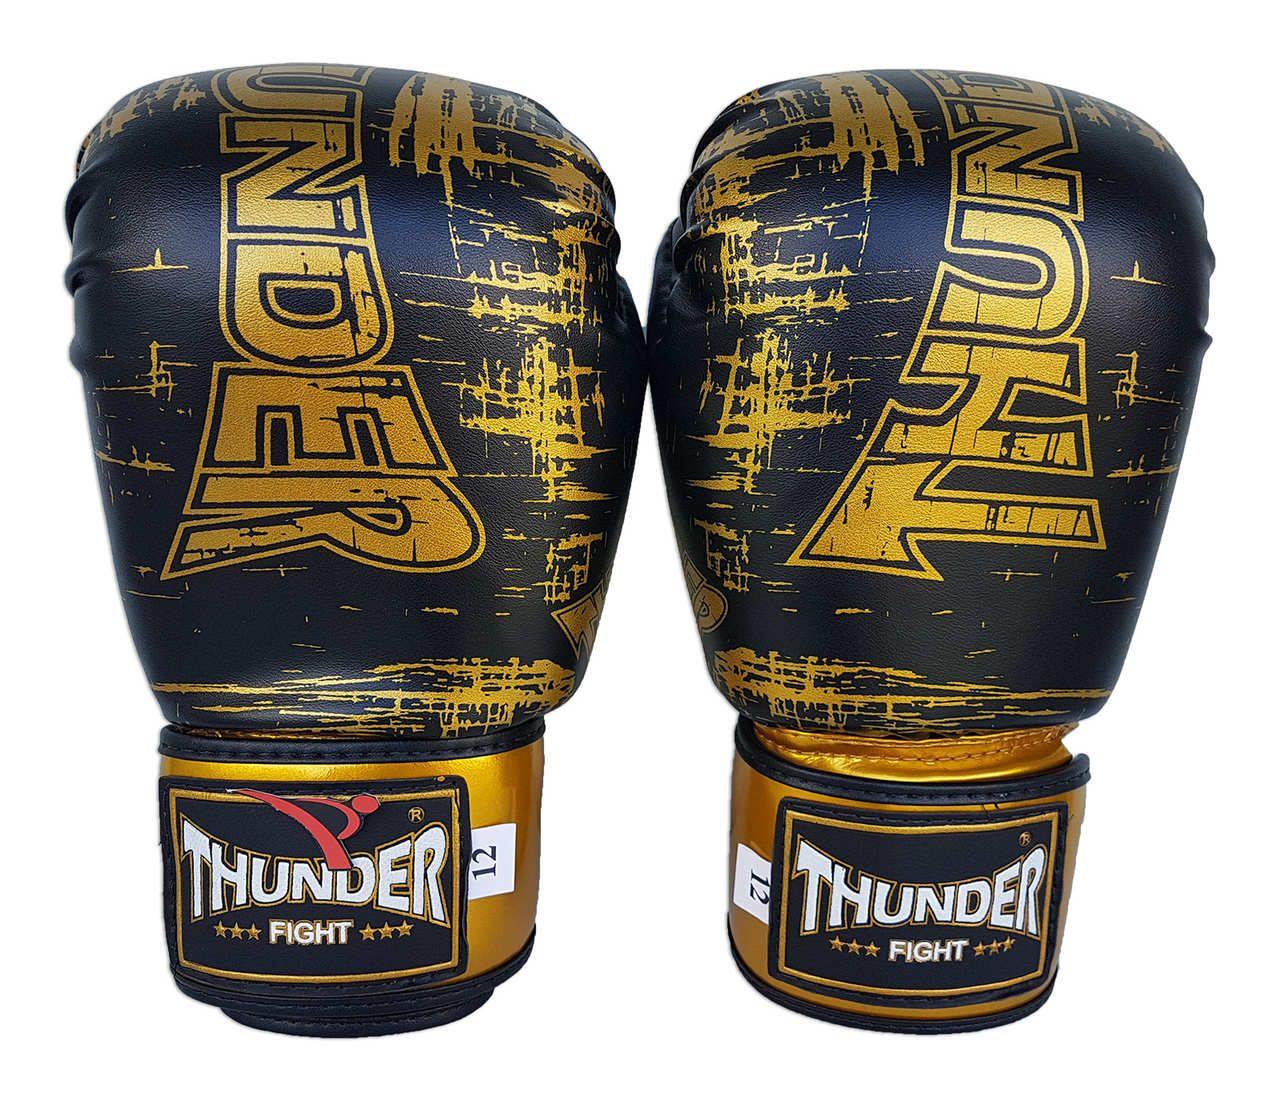 Super Kit de Muay Thai / Kickboxing 14oz - Caneleira G - Preto - Thunder Fight  - PRALUTA SHOP